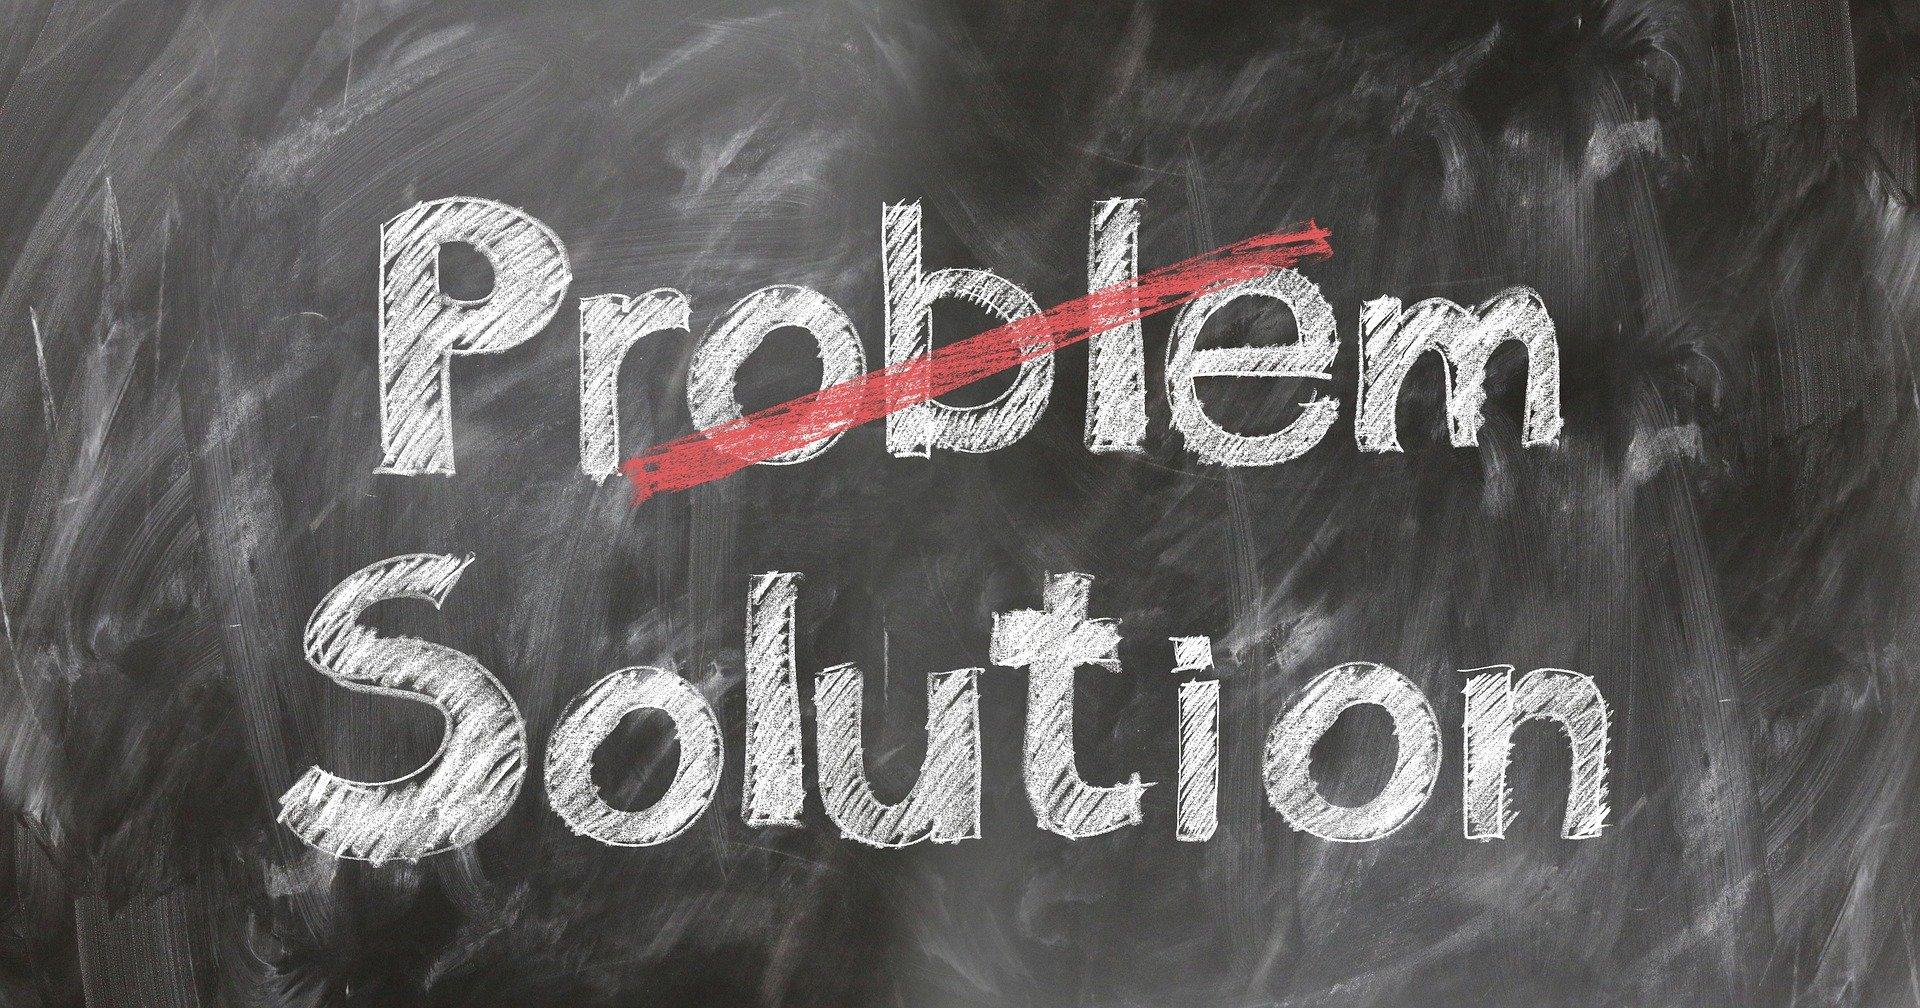 probleme, solutii - sursa: Pixabay